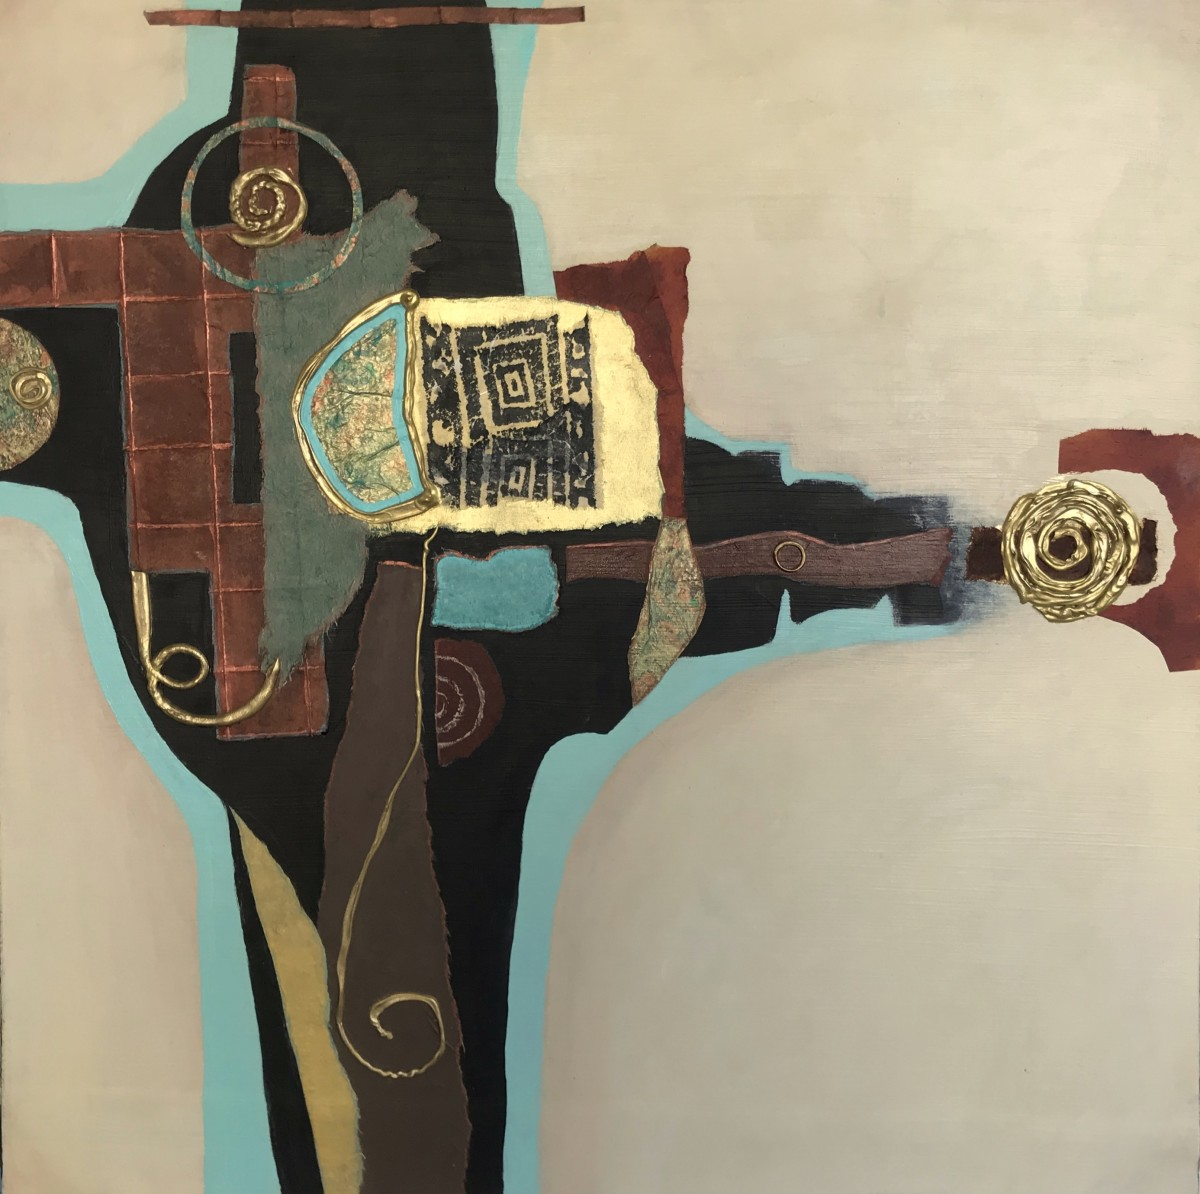 Reliquary by Mari O'Brien